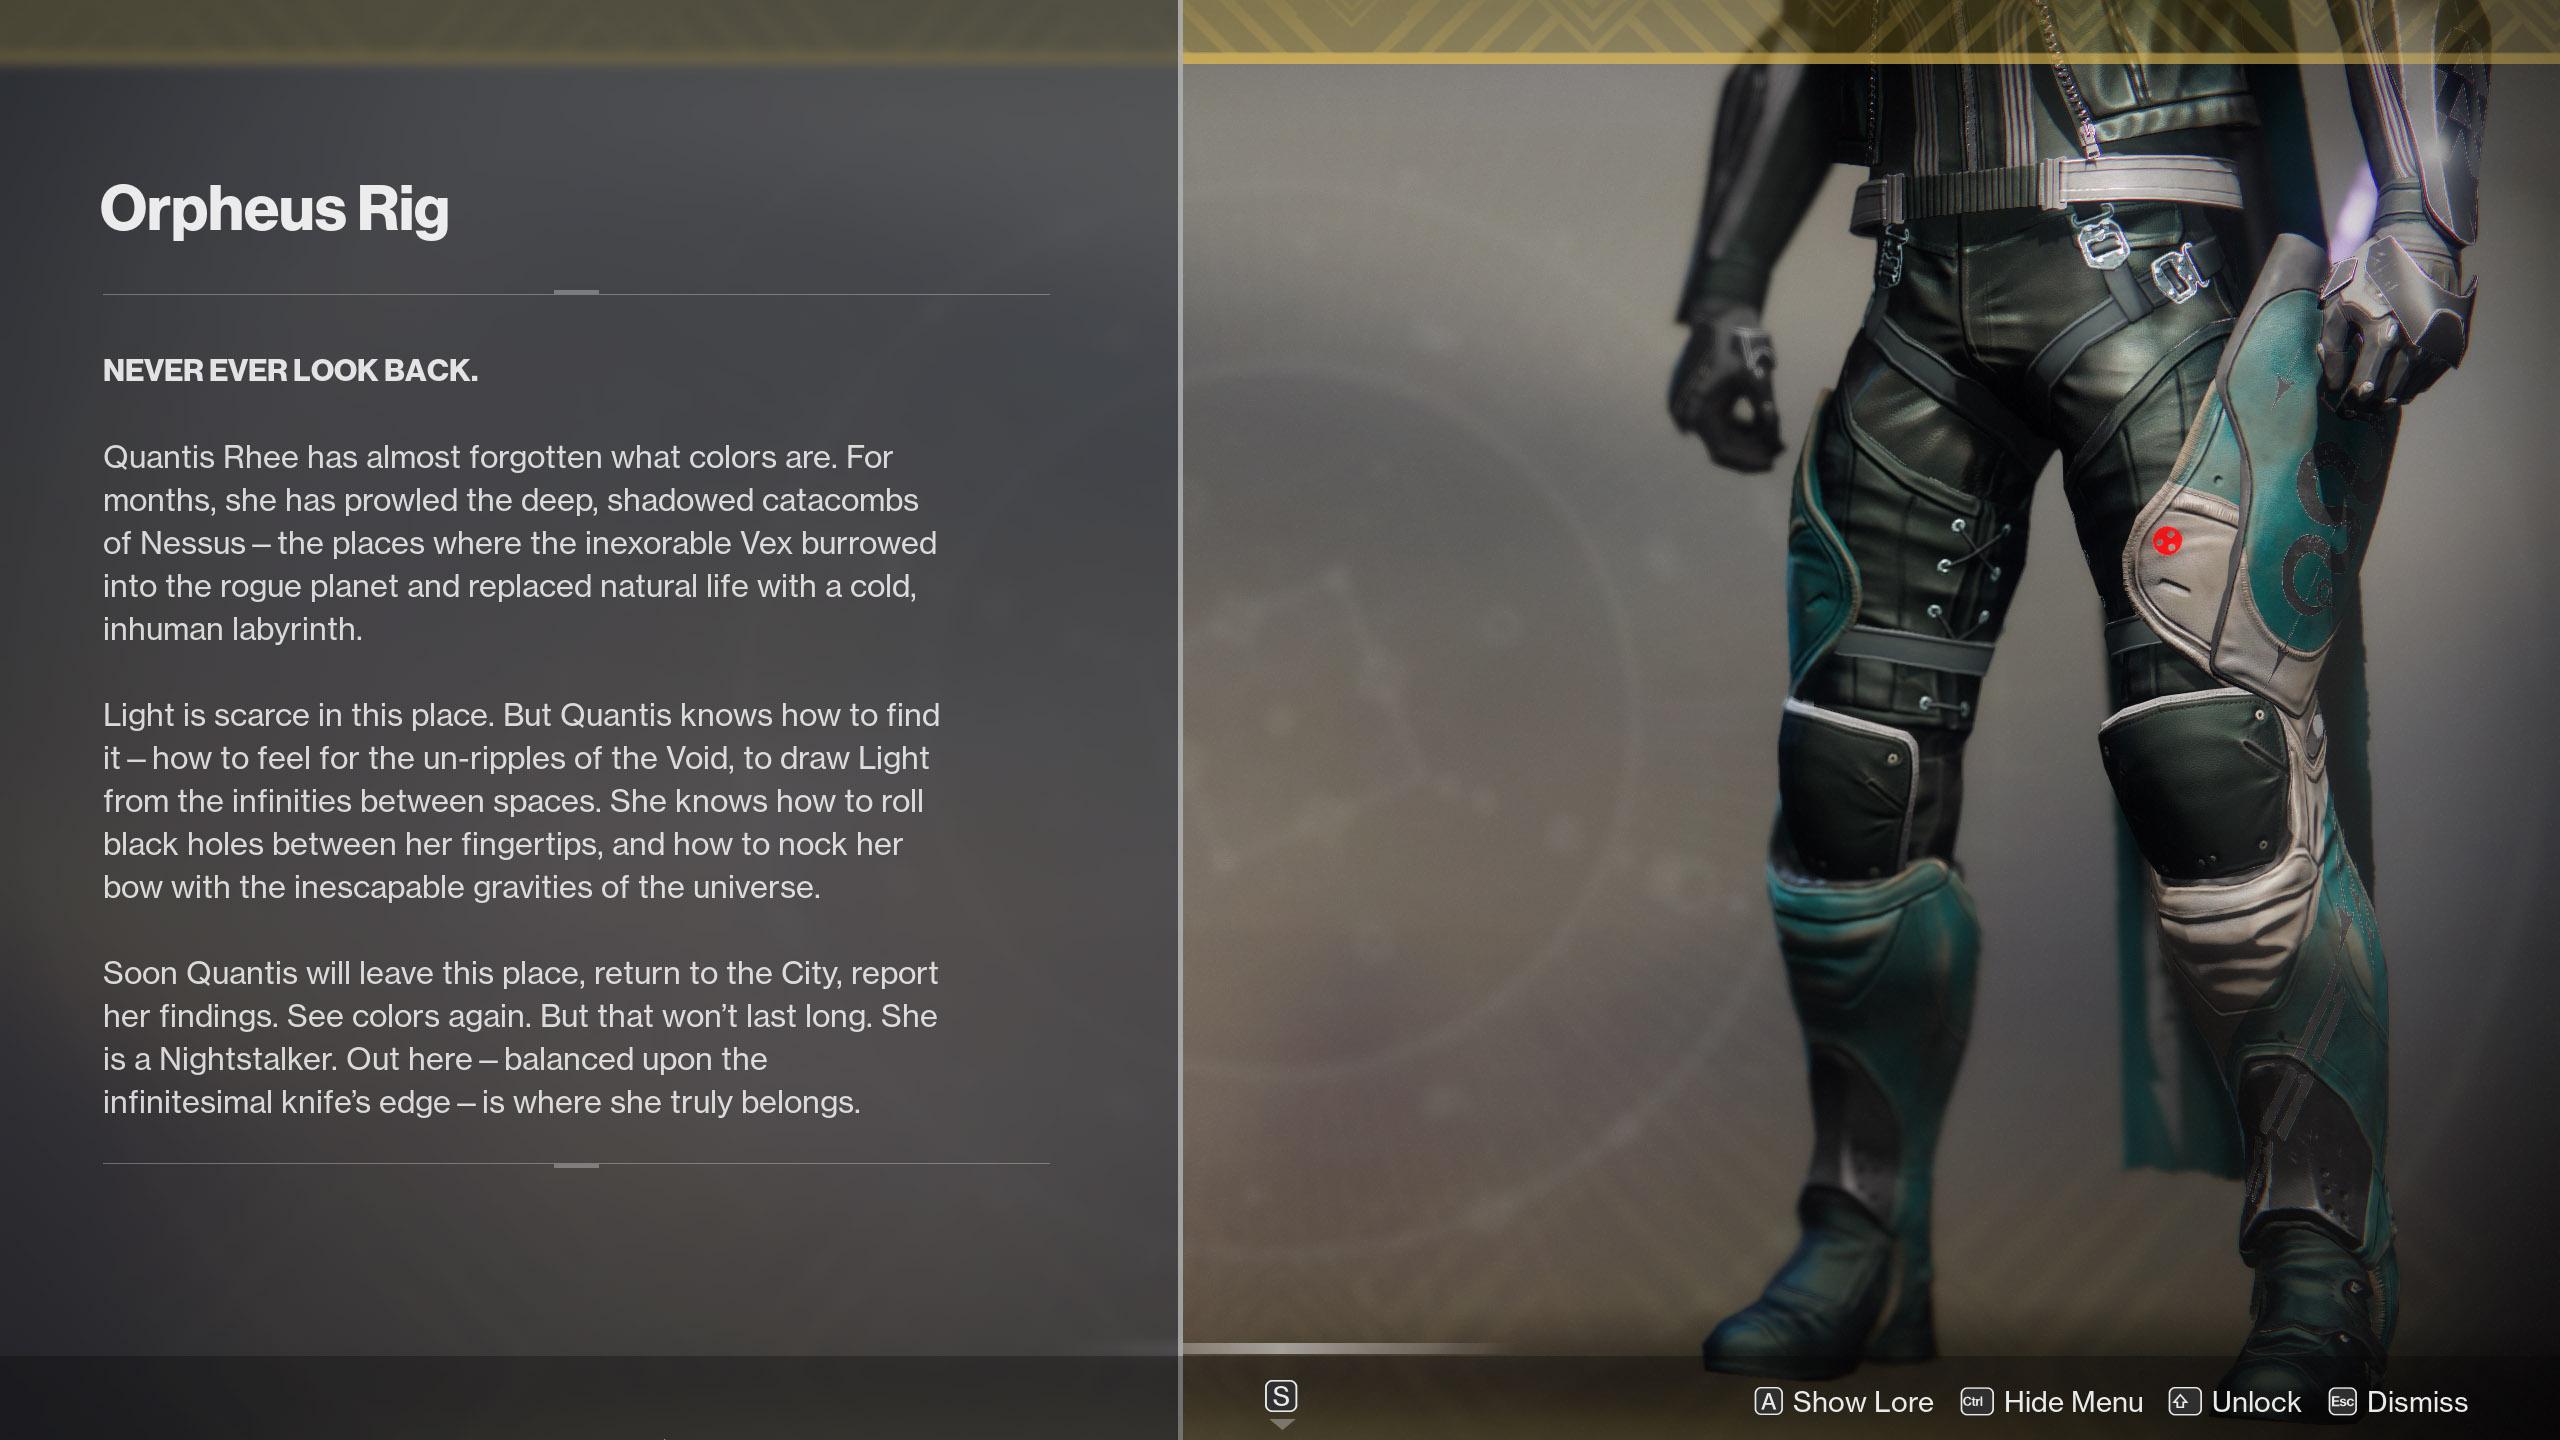 Orpheus Rig Lore Destiny 2